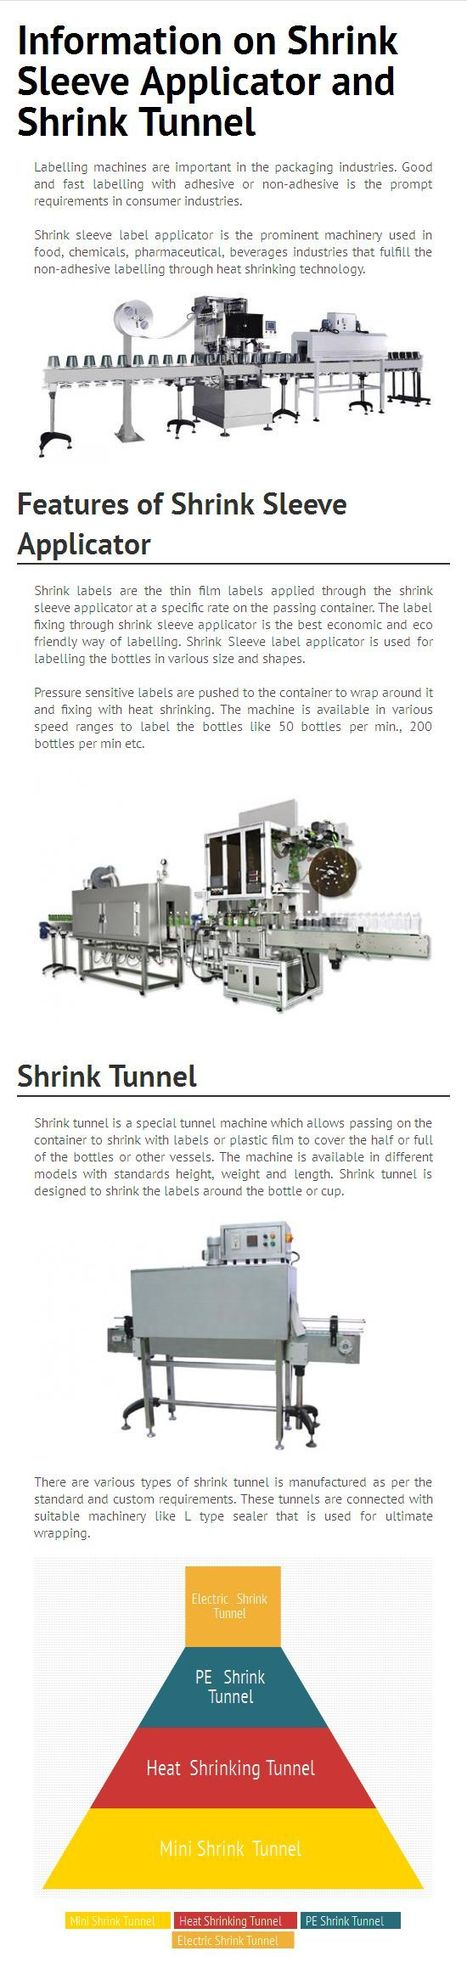 Information on Shrink Sleeve Applicator and Shrink Tunnel | Shrink Tunnel | Scoop.it